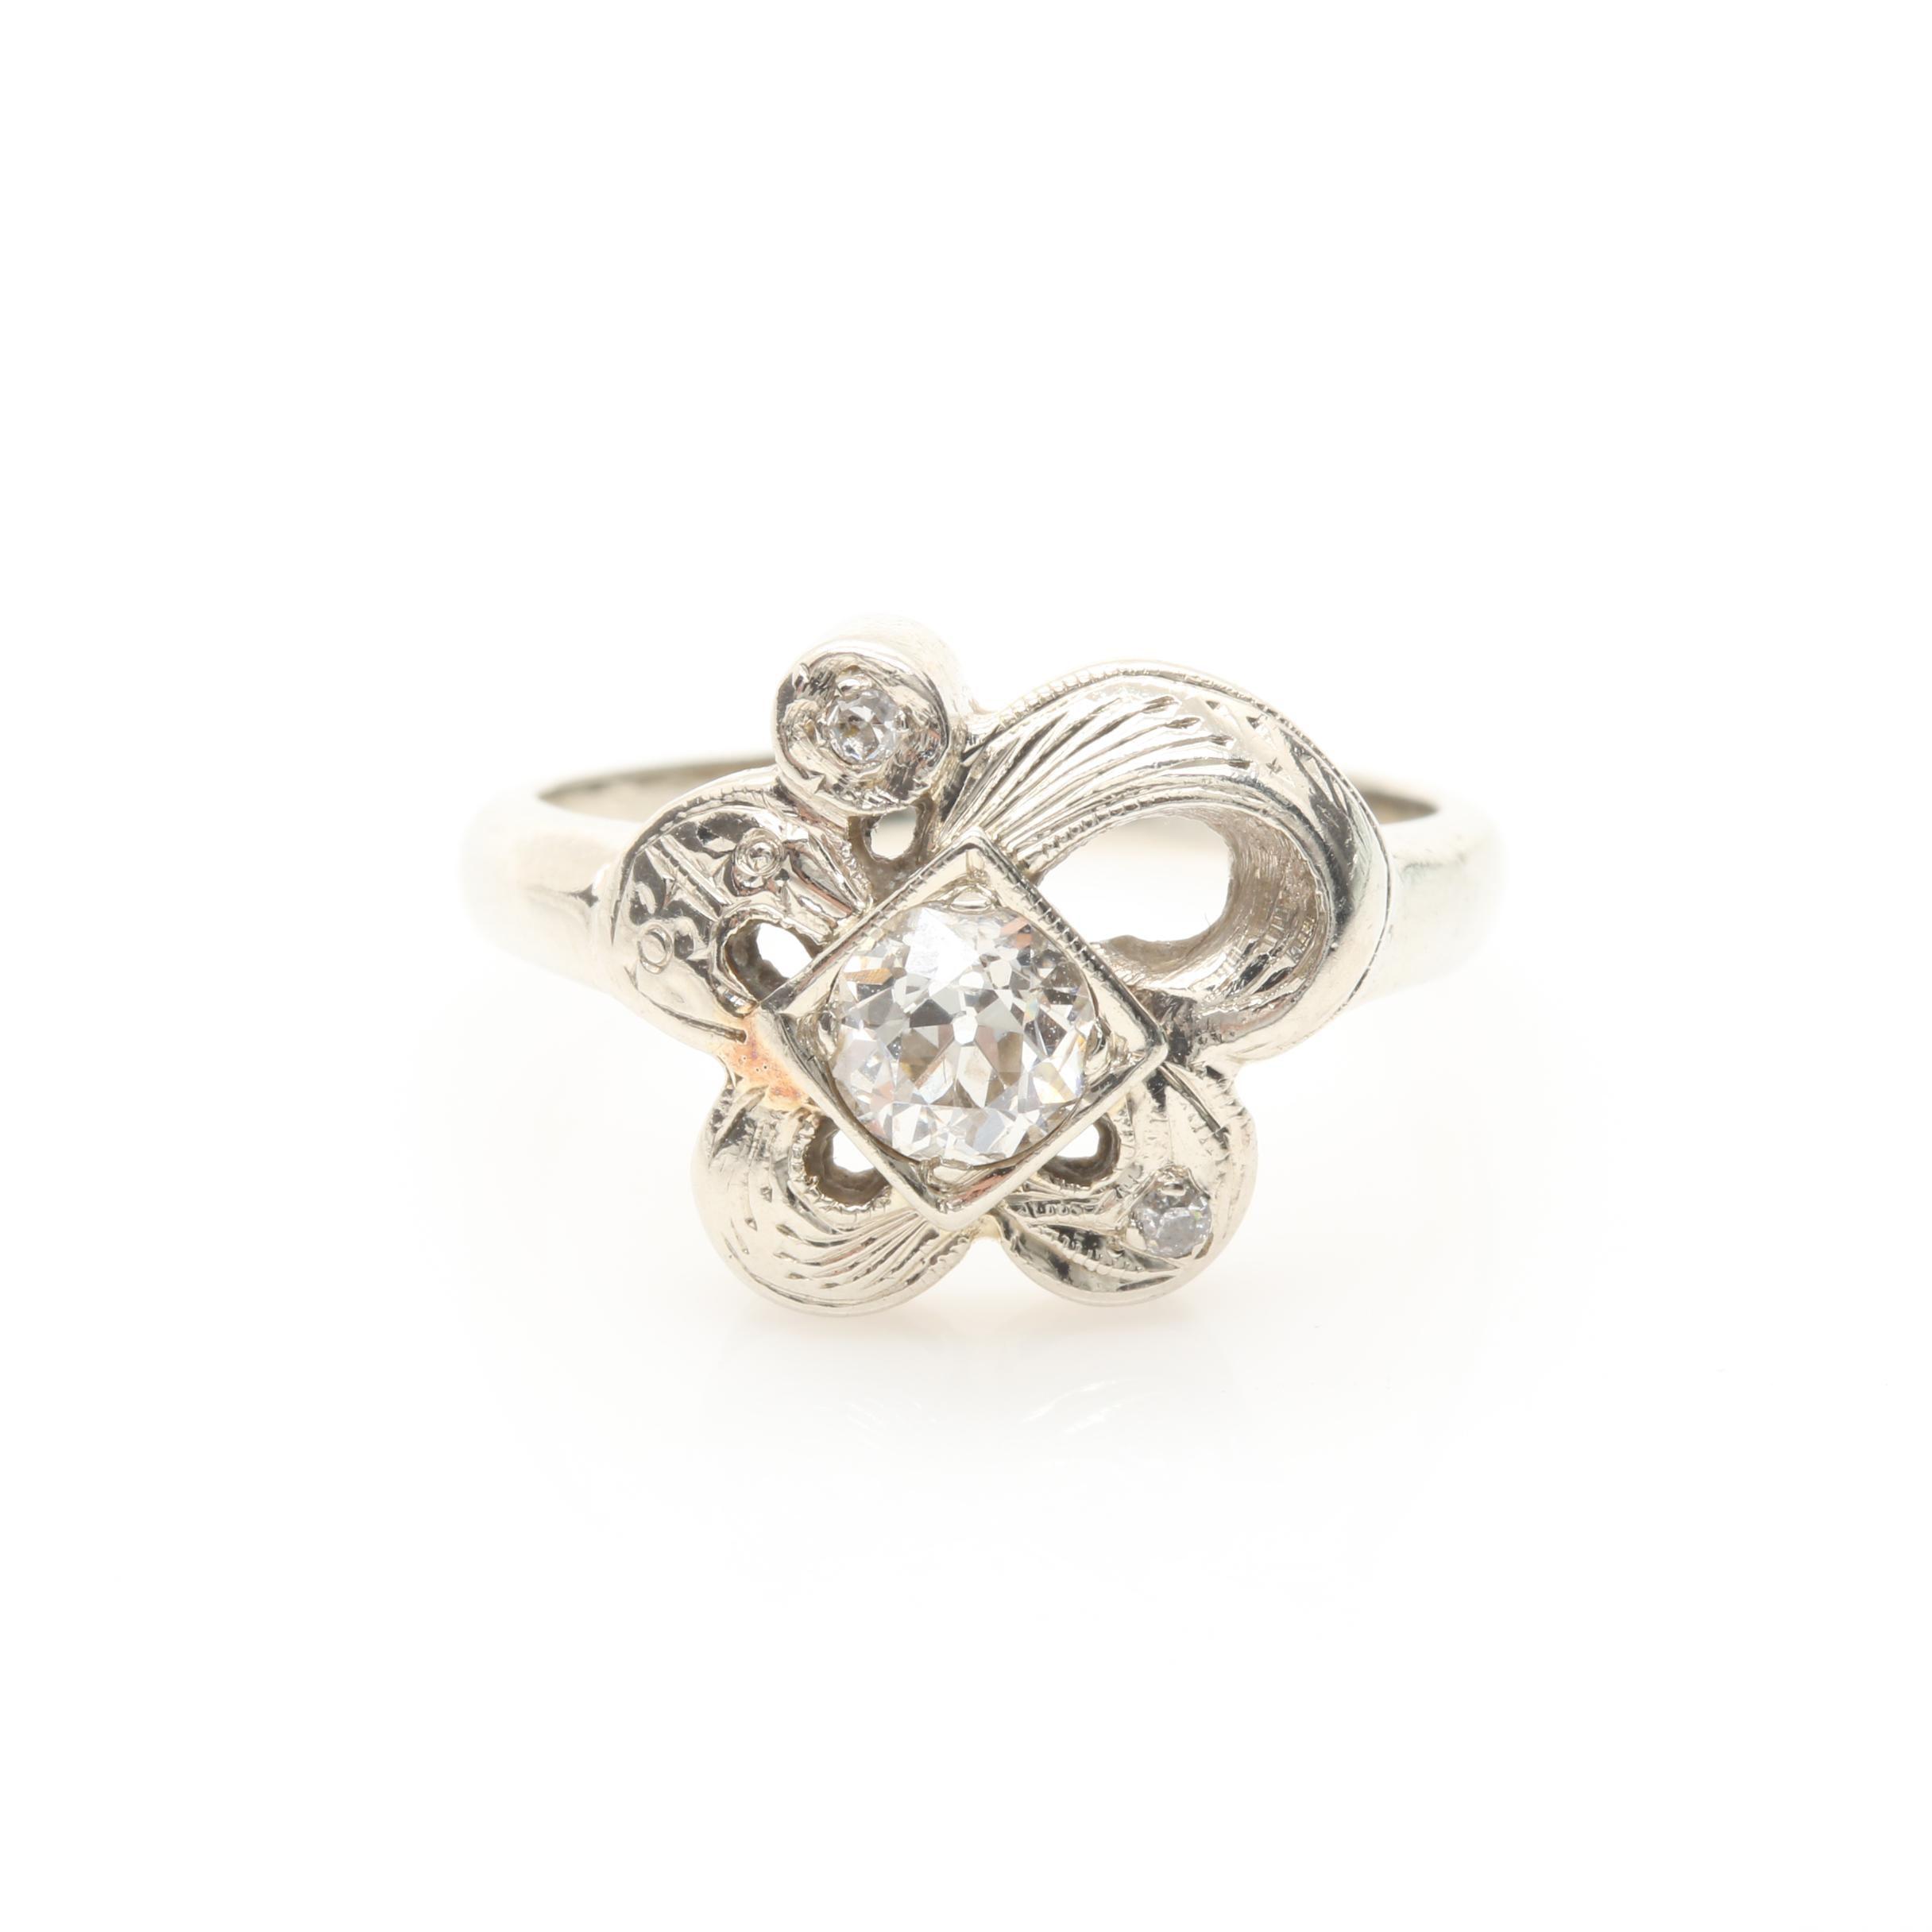 14K White Gold 0.38 CTW Diamond Ring